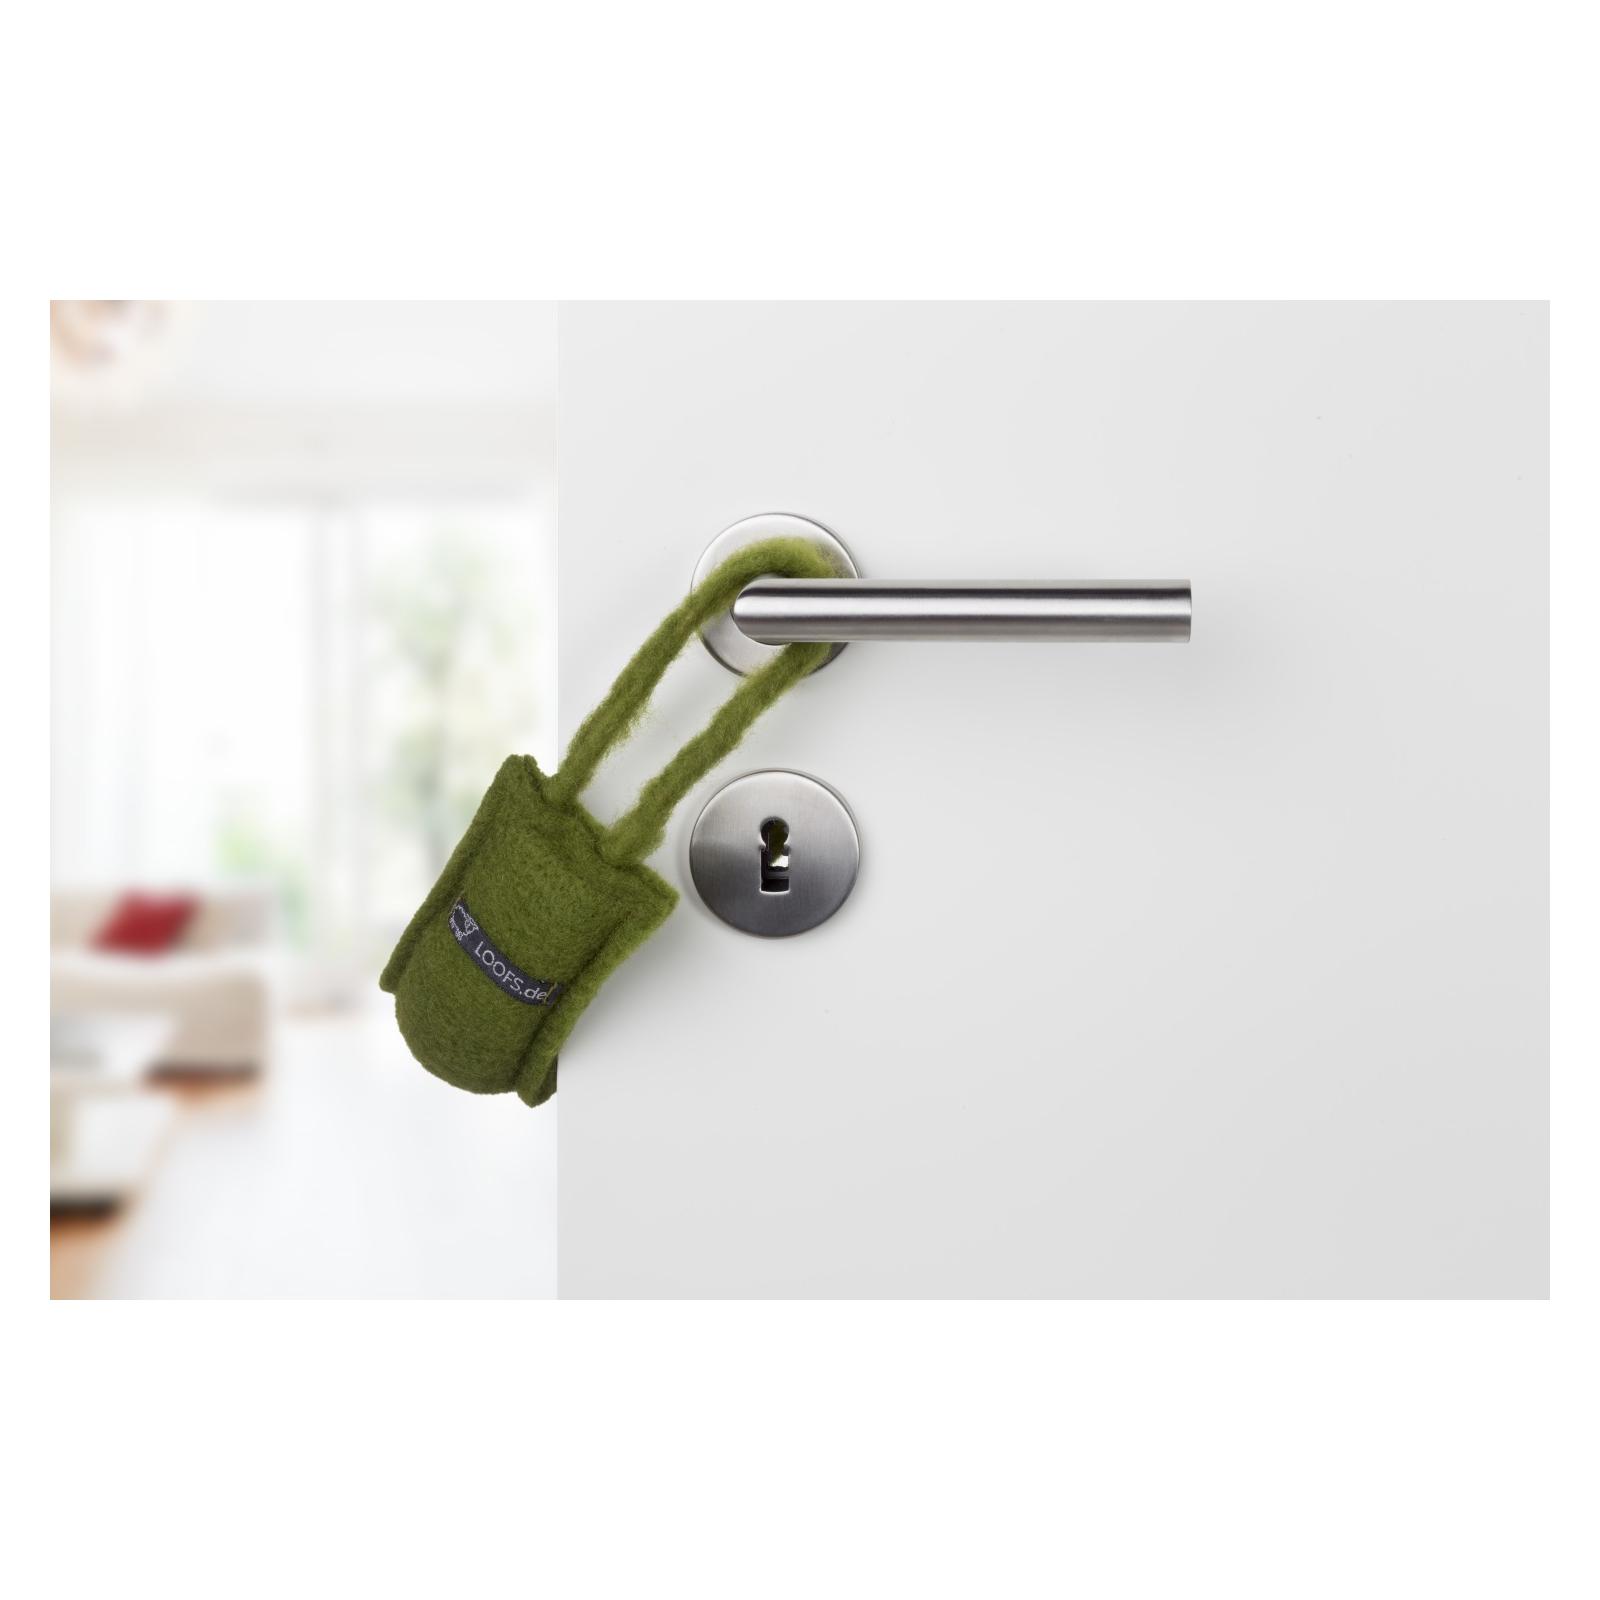 5X Türpuffer Türkordel Doorstop Stopper Türboy Sicherheit Türstopper Klemmschutz